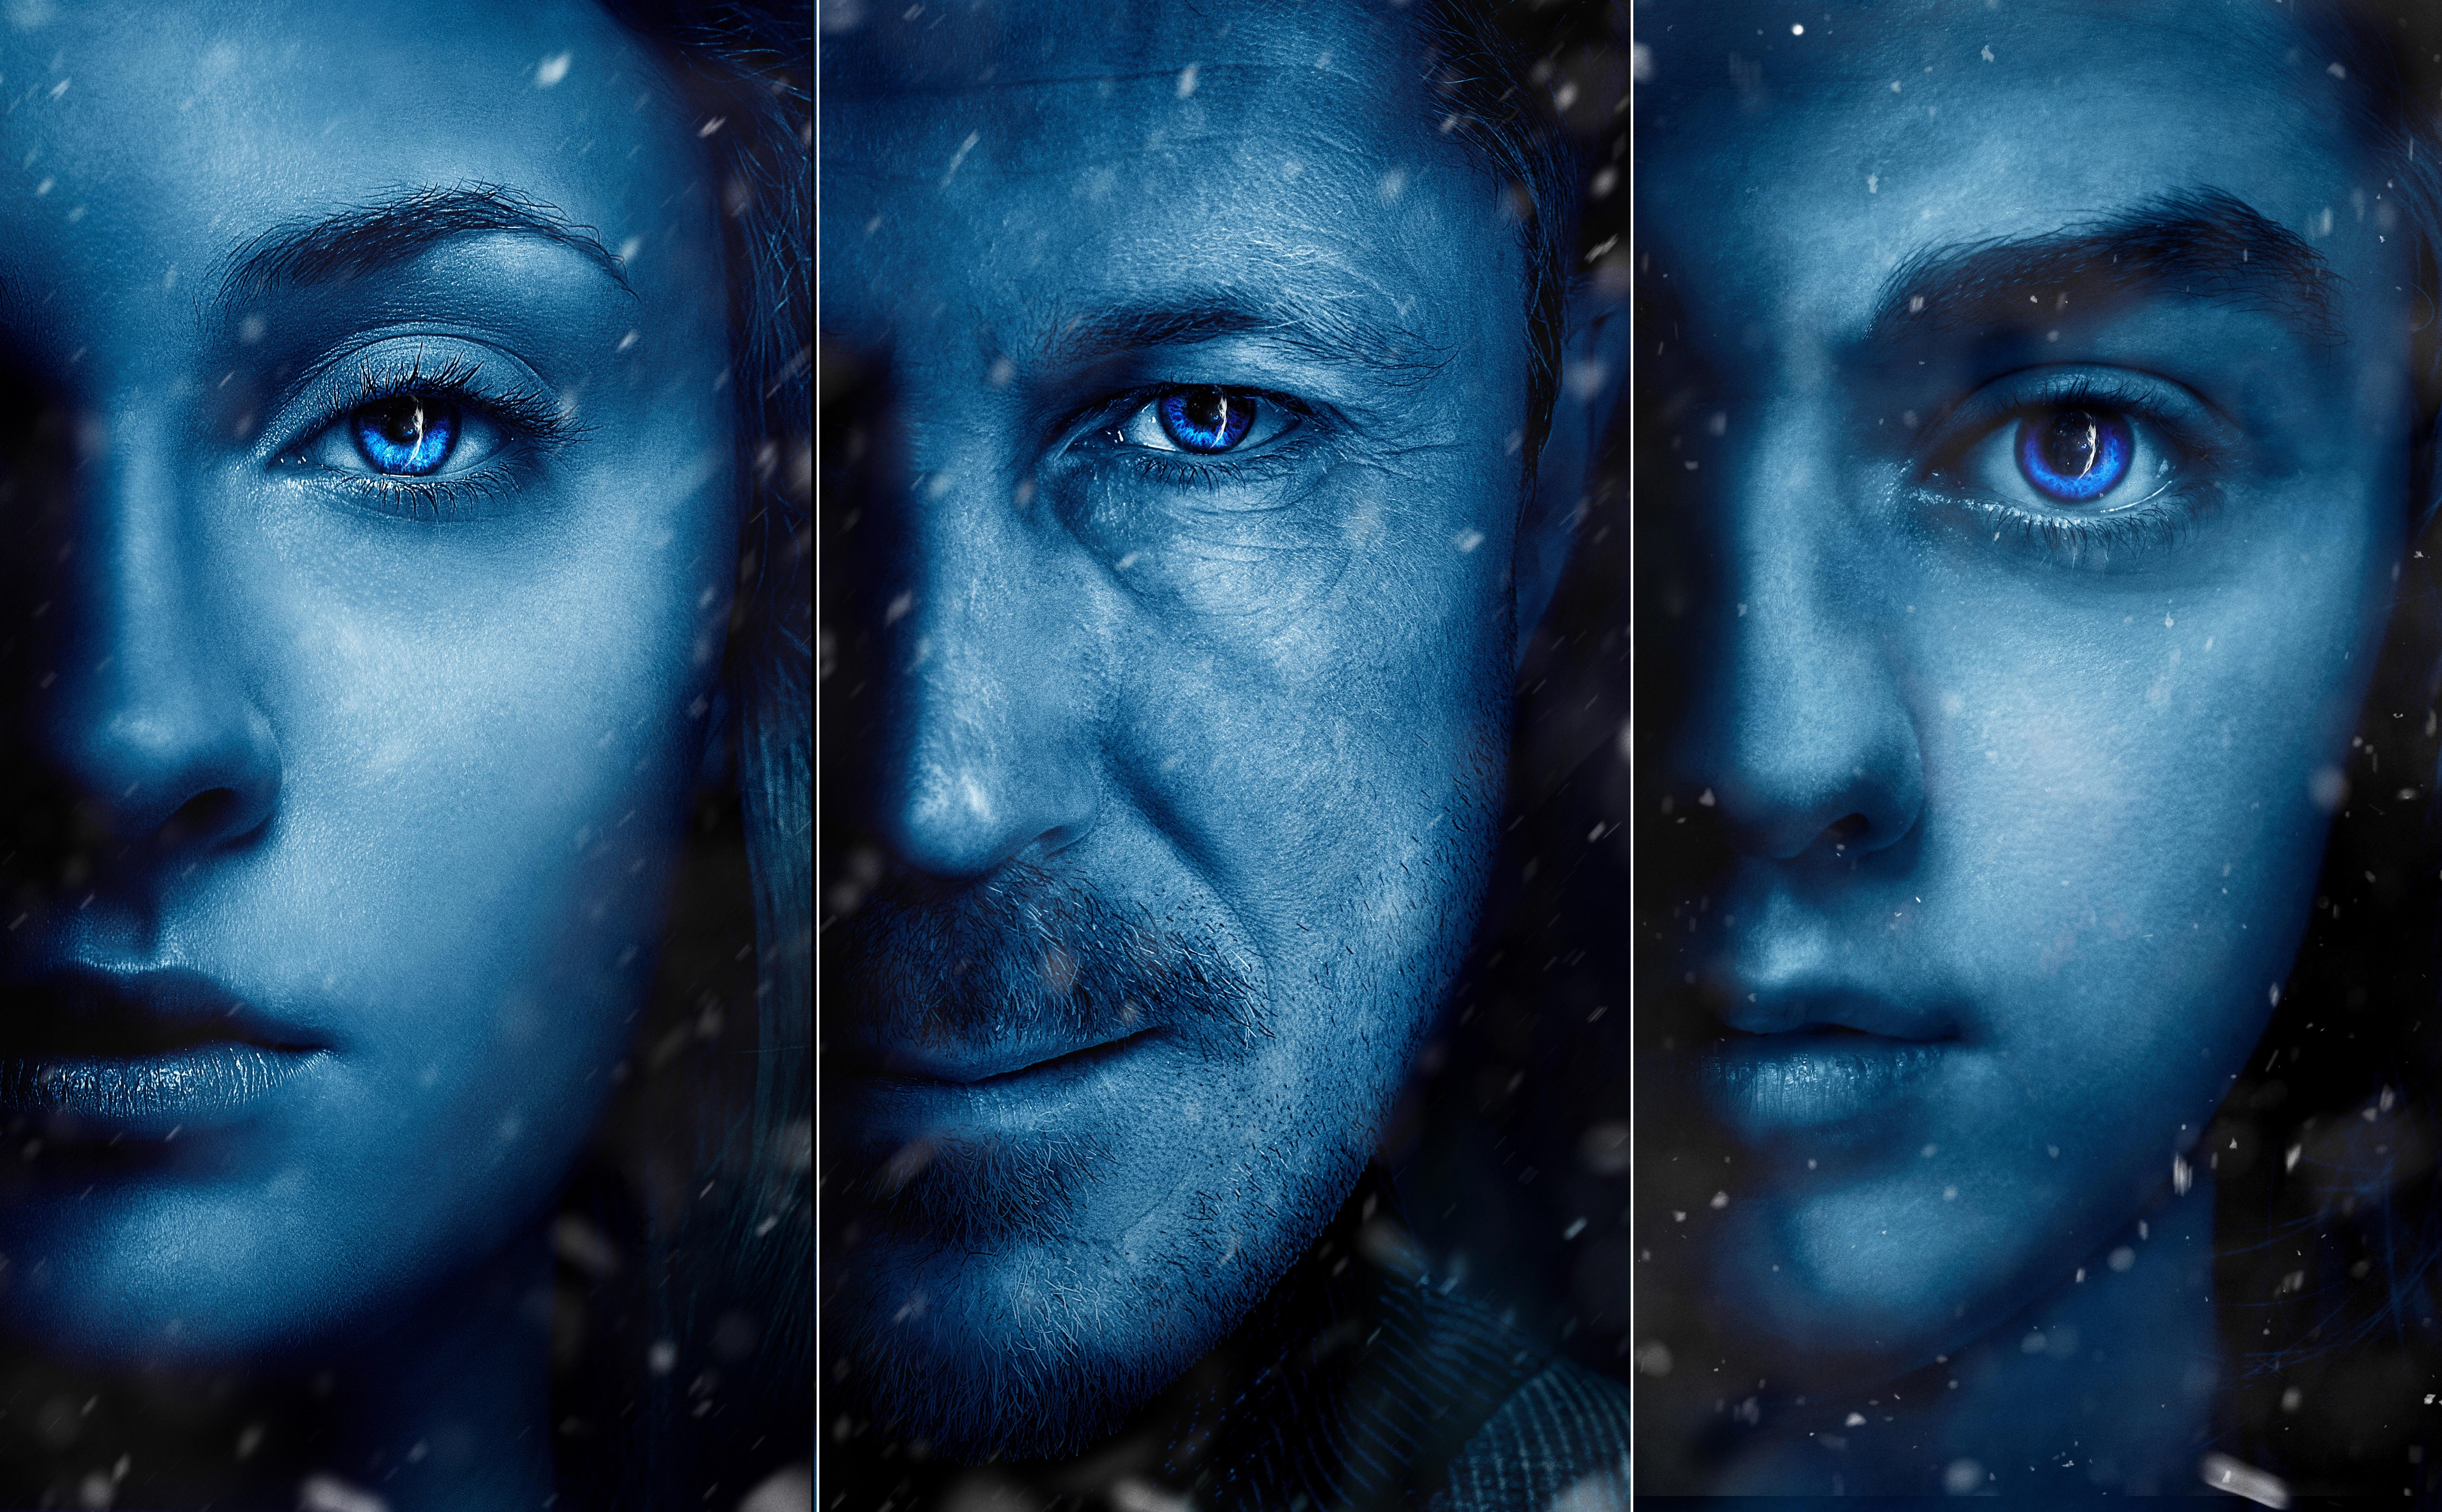 Arya Stark Sansa Stark Petyr Baelish Posters Game Of Thrones Season